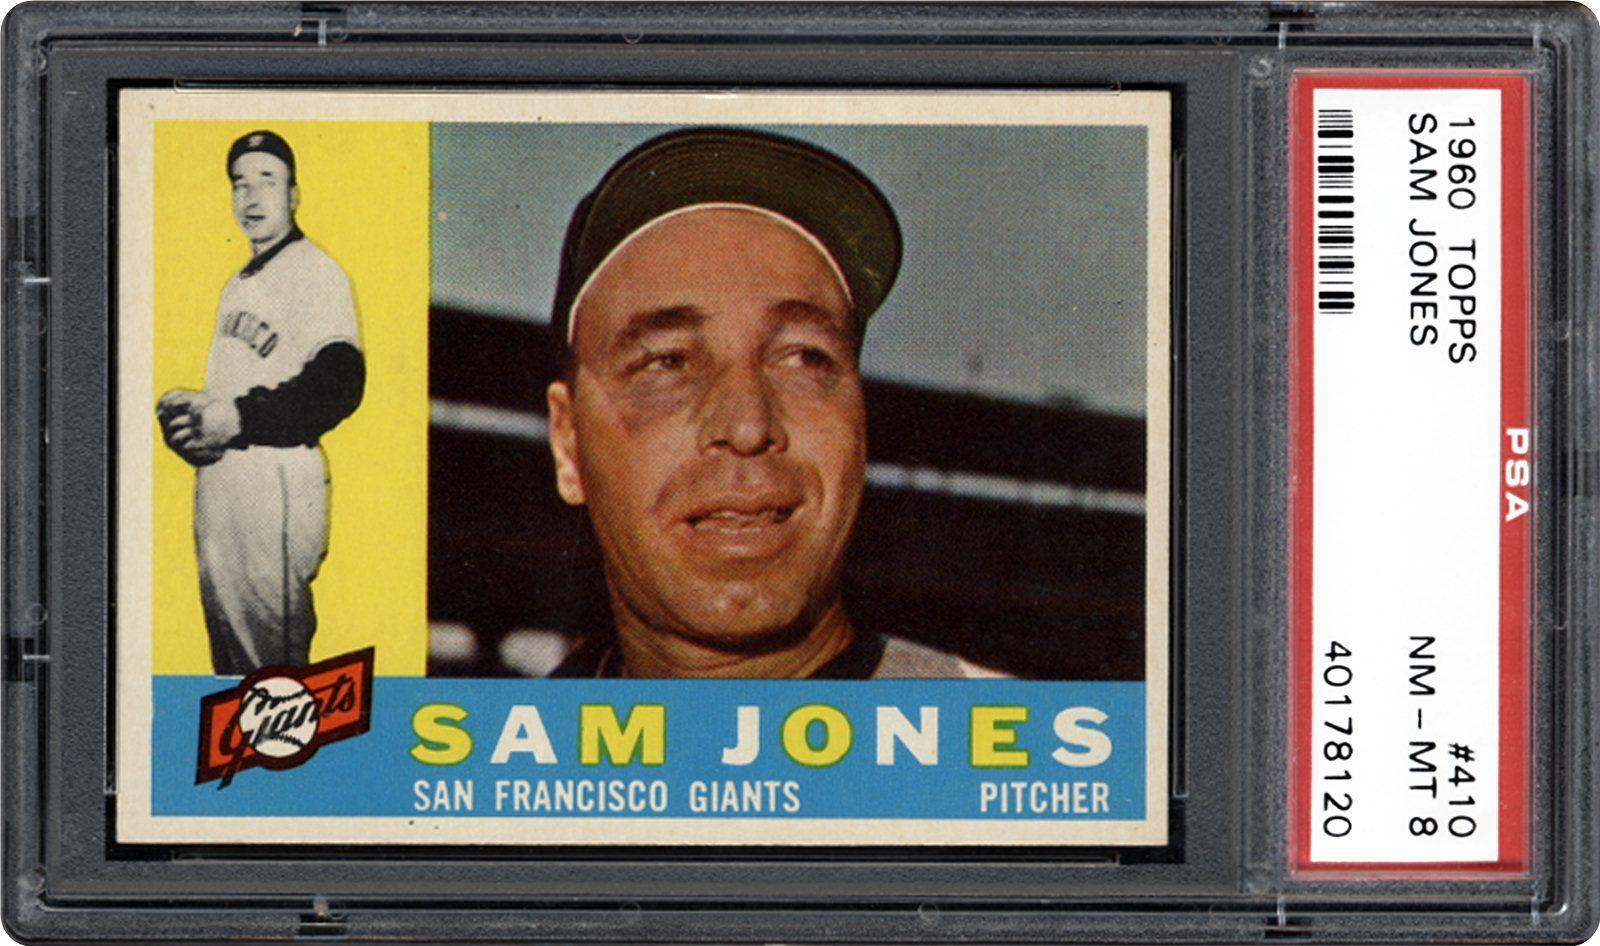 1960 Topps Sam Jones PSA CardFacts™ Baseball cards